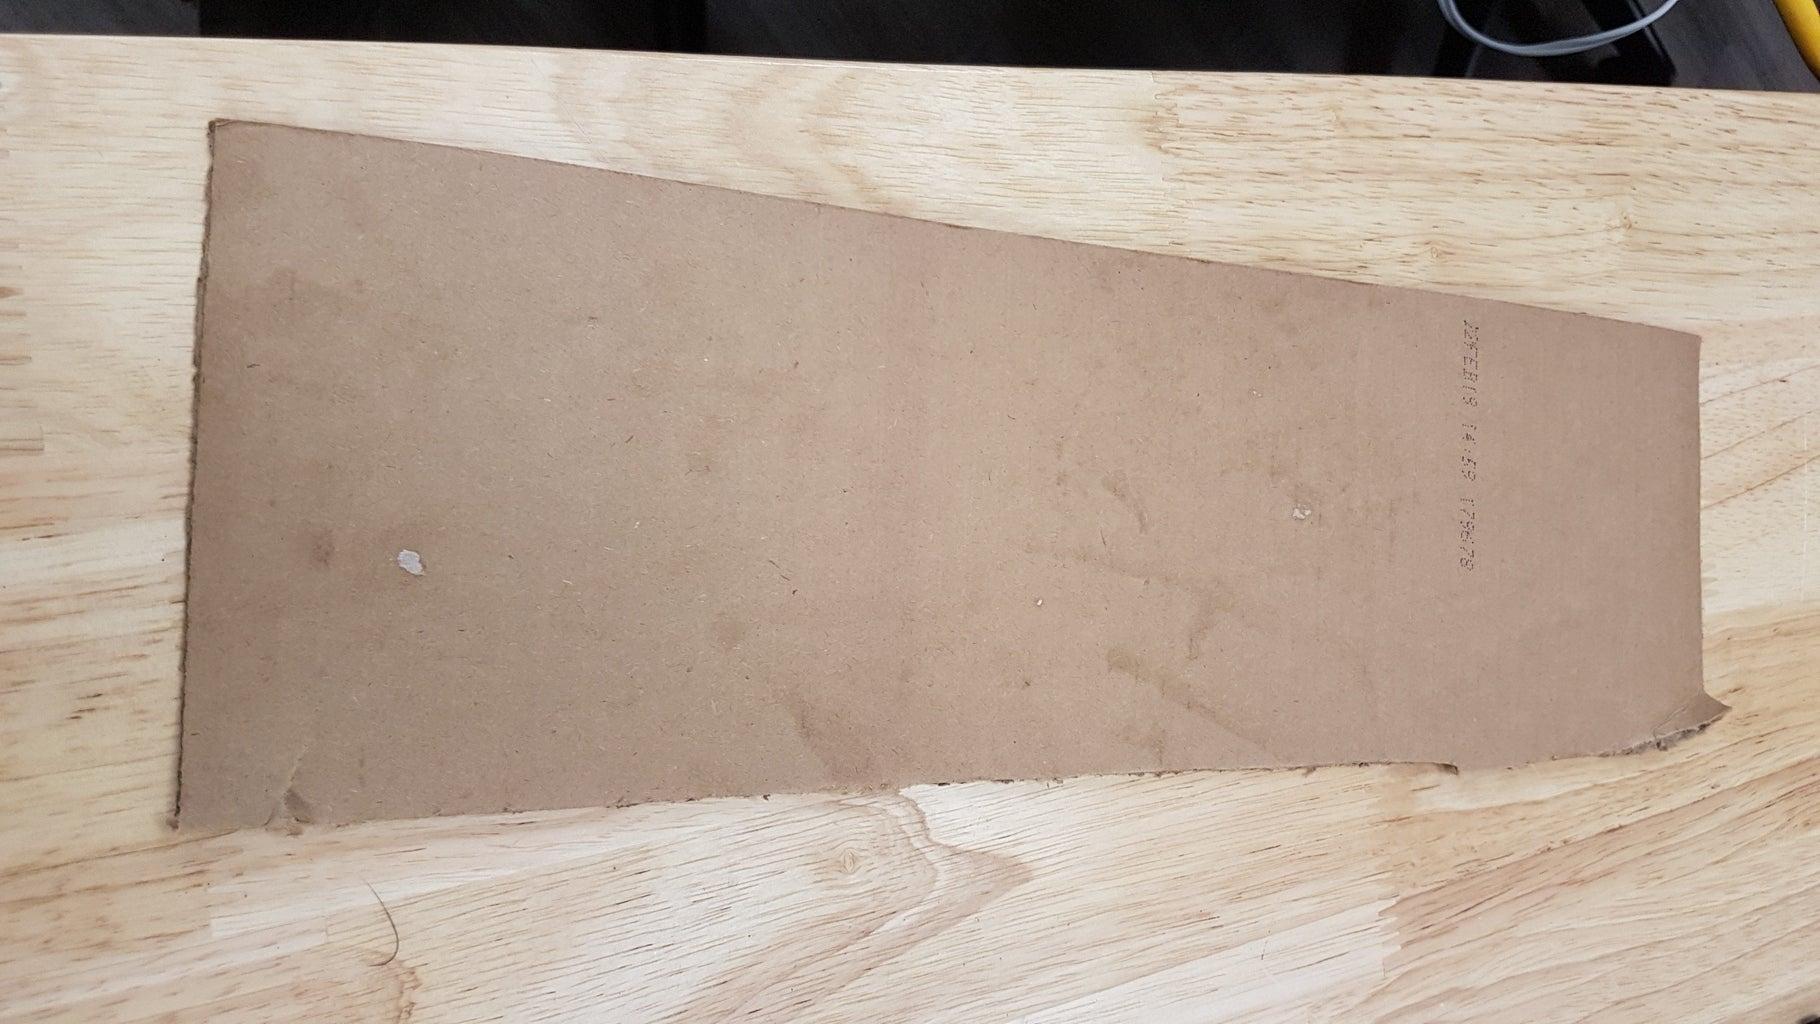 Step 1: Glue Down the Road